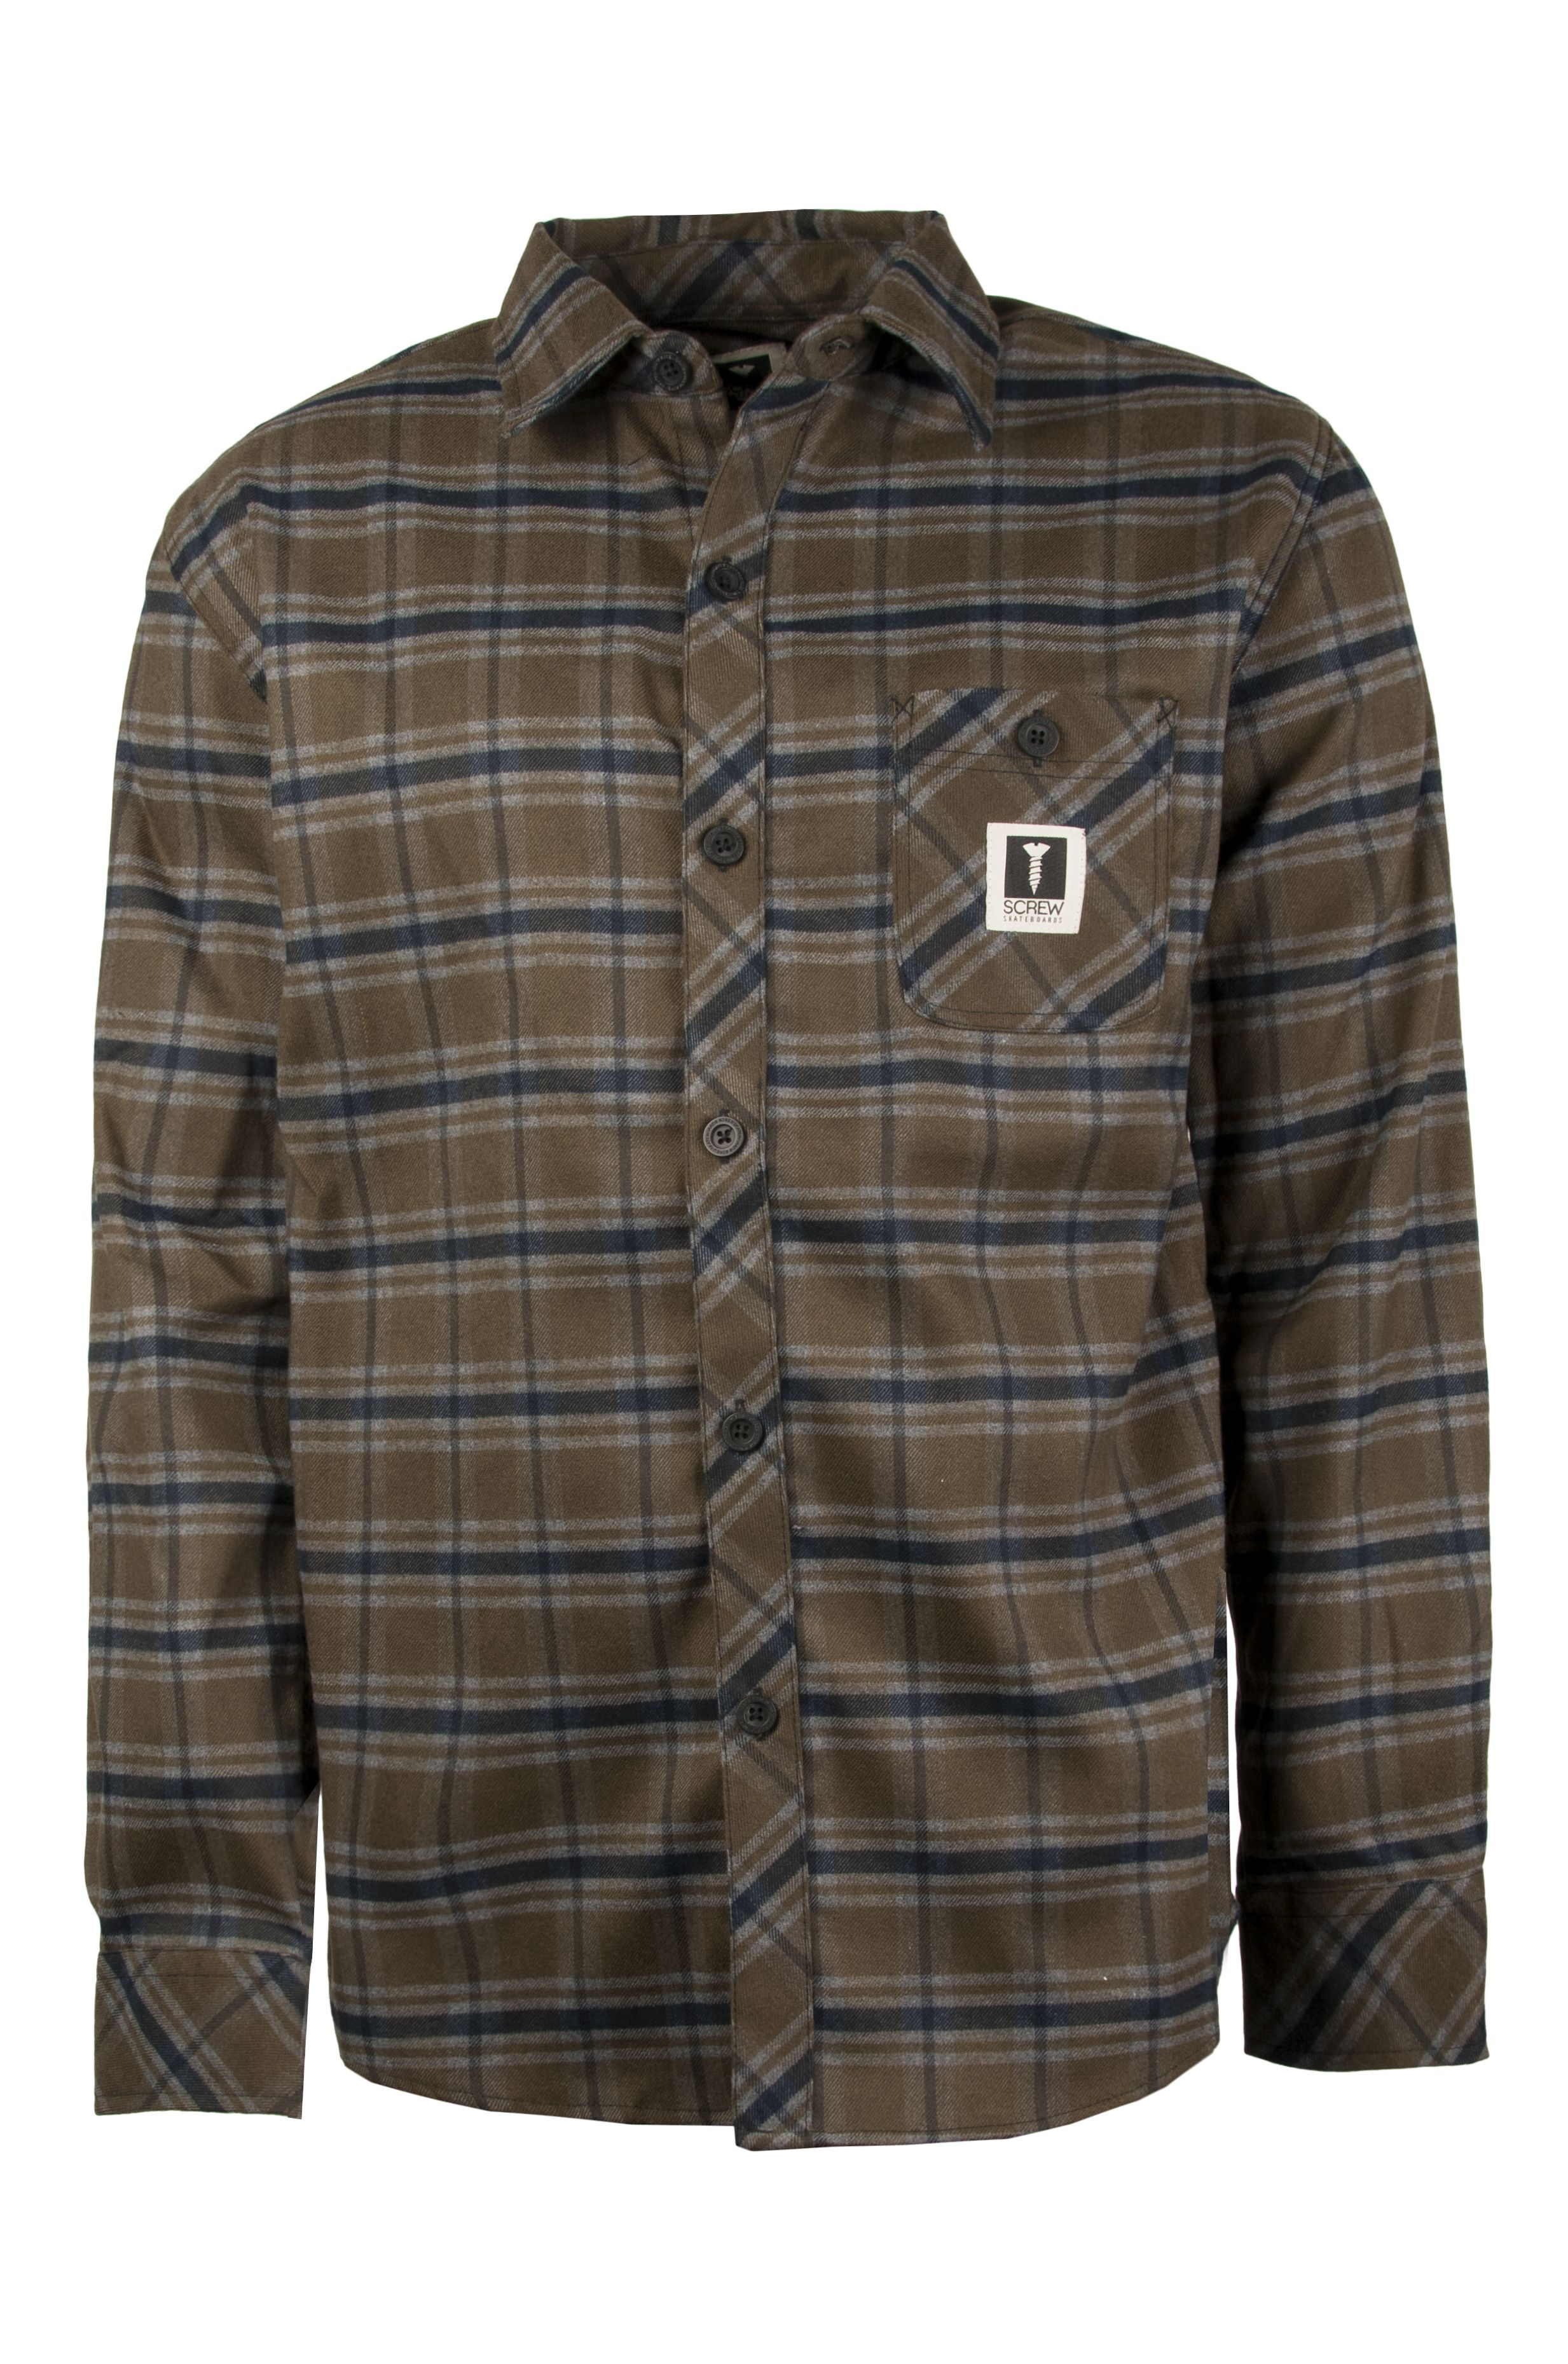 Screw Shirt CURBS?21 Olive